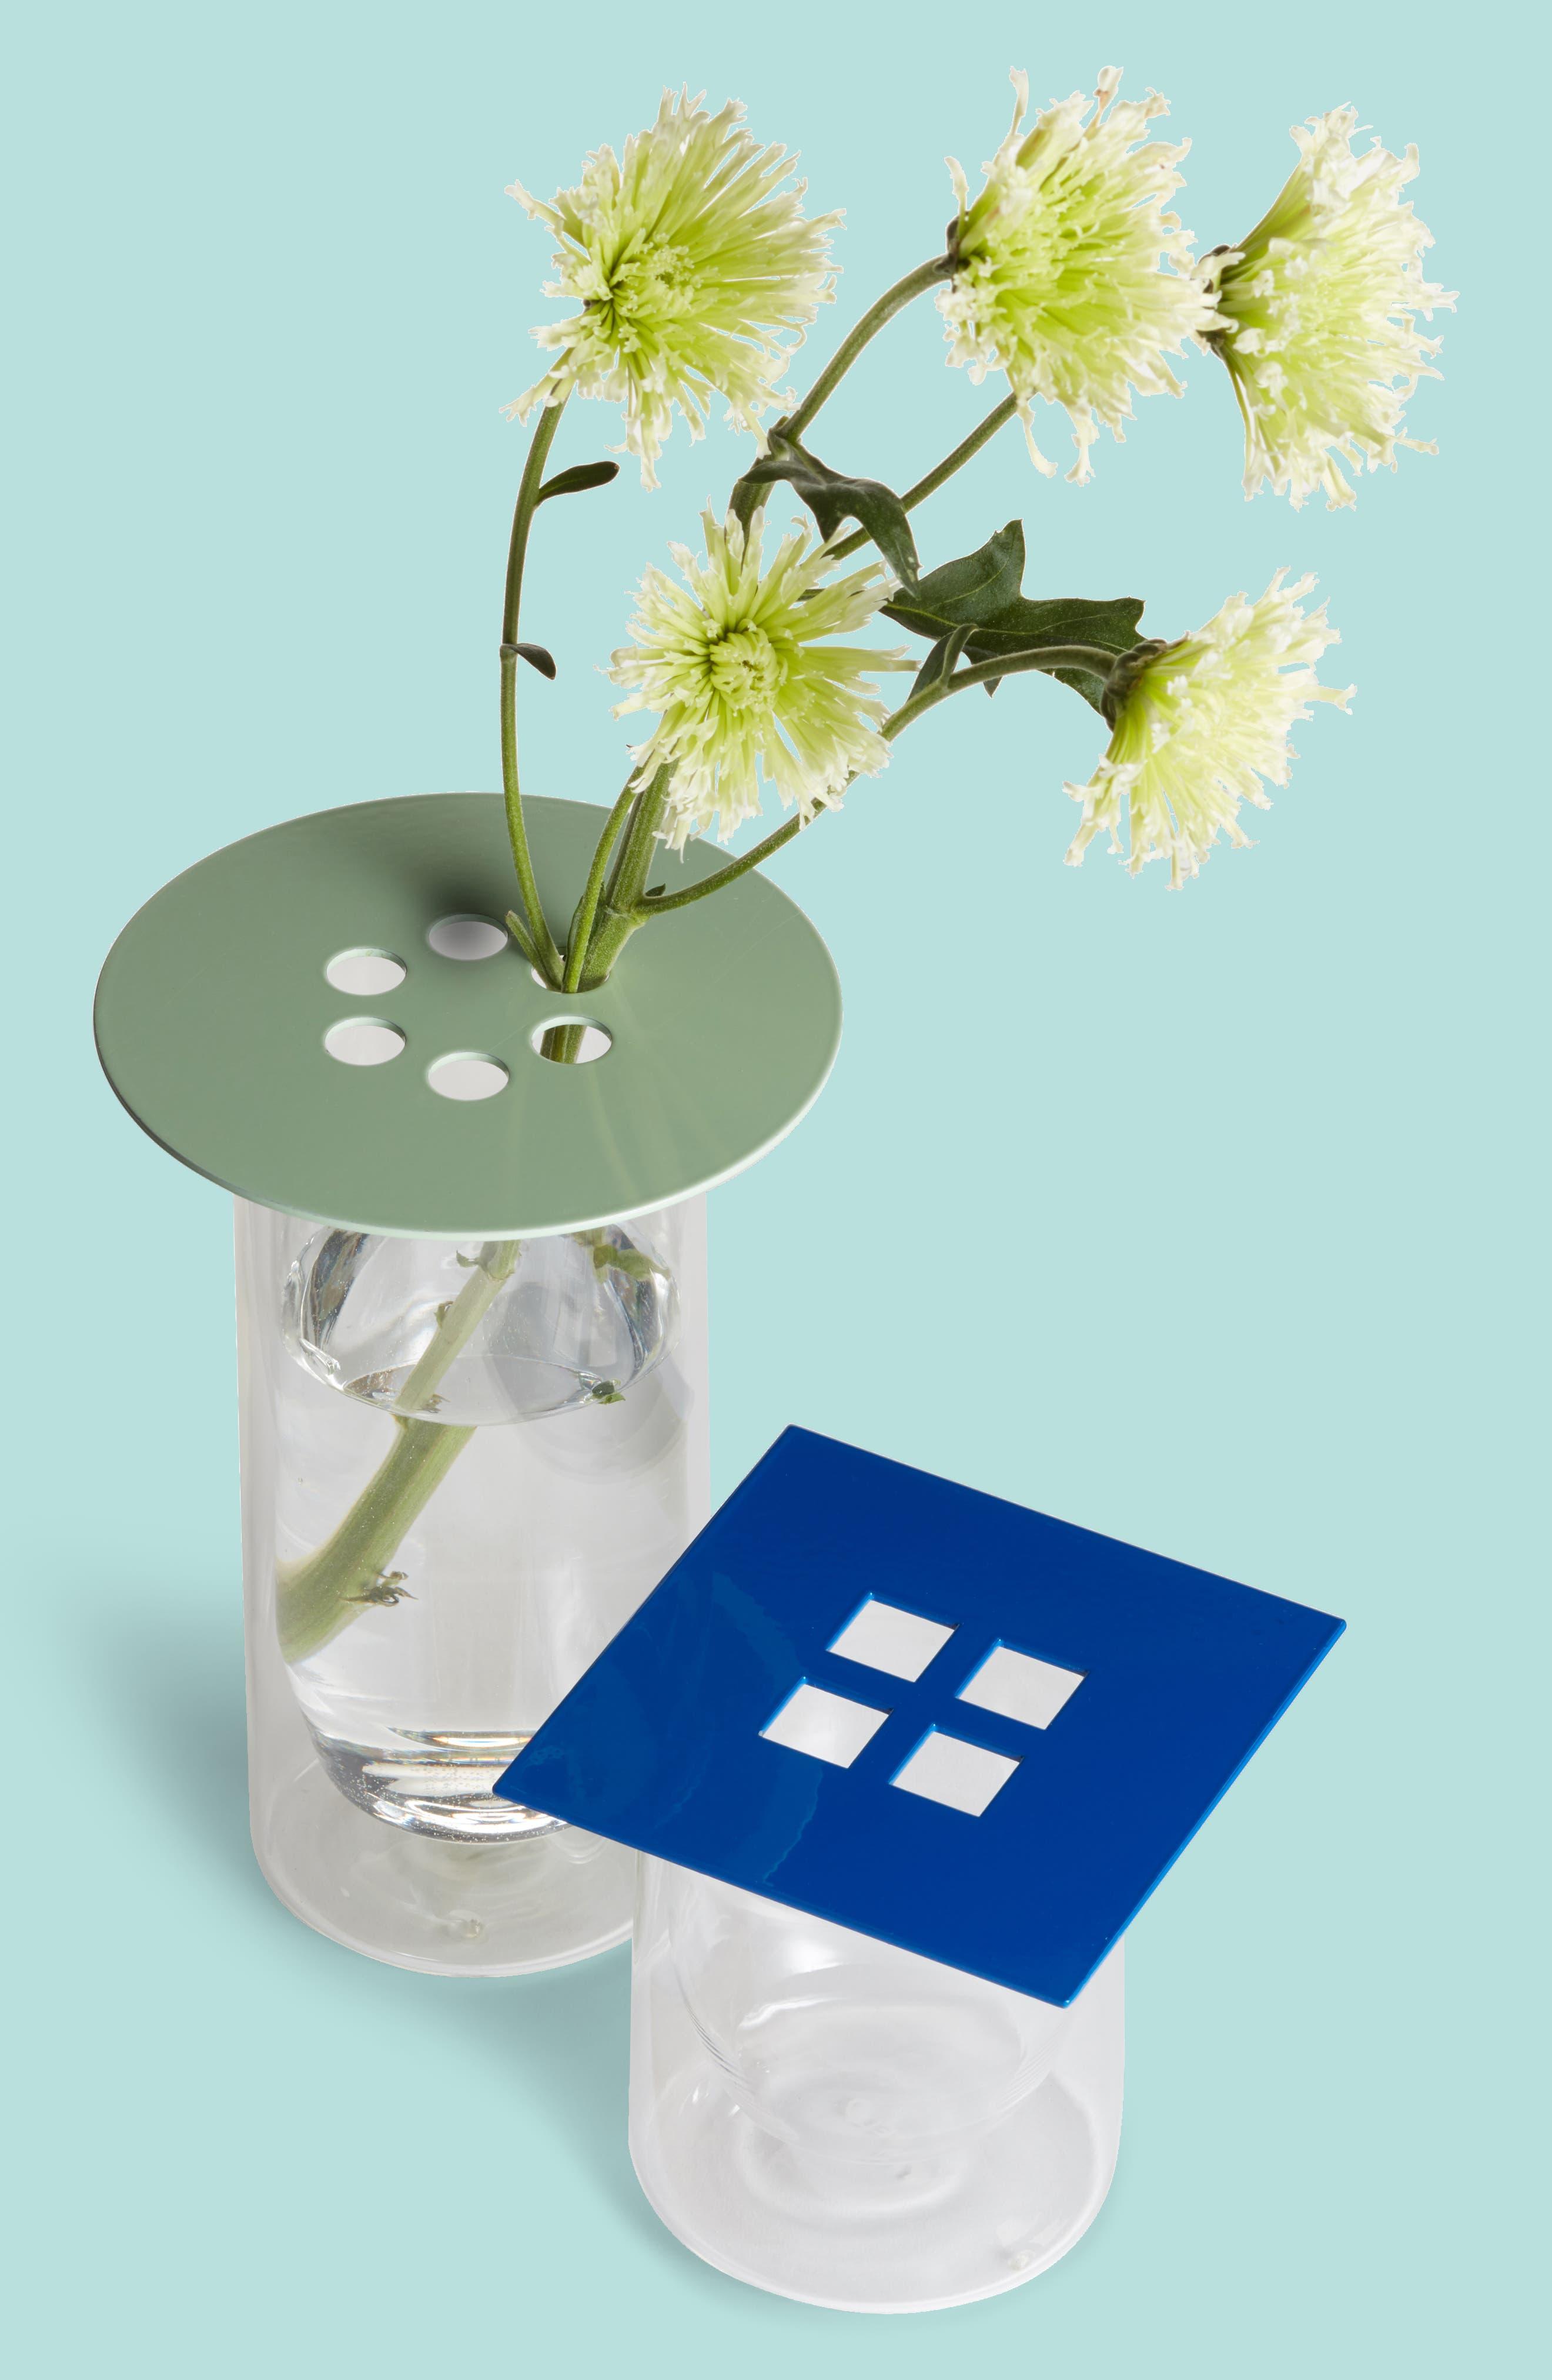 Set of 3 Anywhere Vase Converters,                             Main thumbnail 1, color,                             Tan/Mint/Cobal